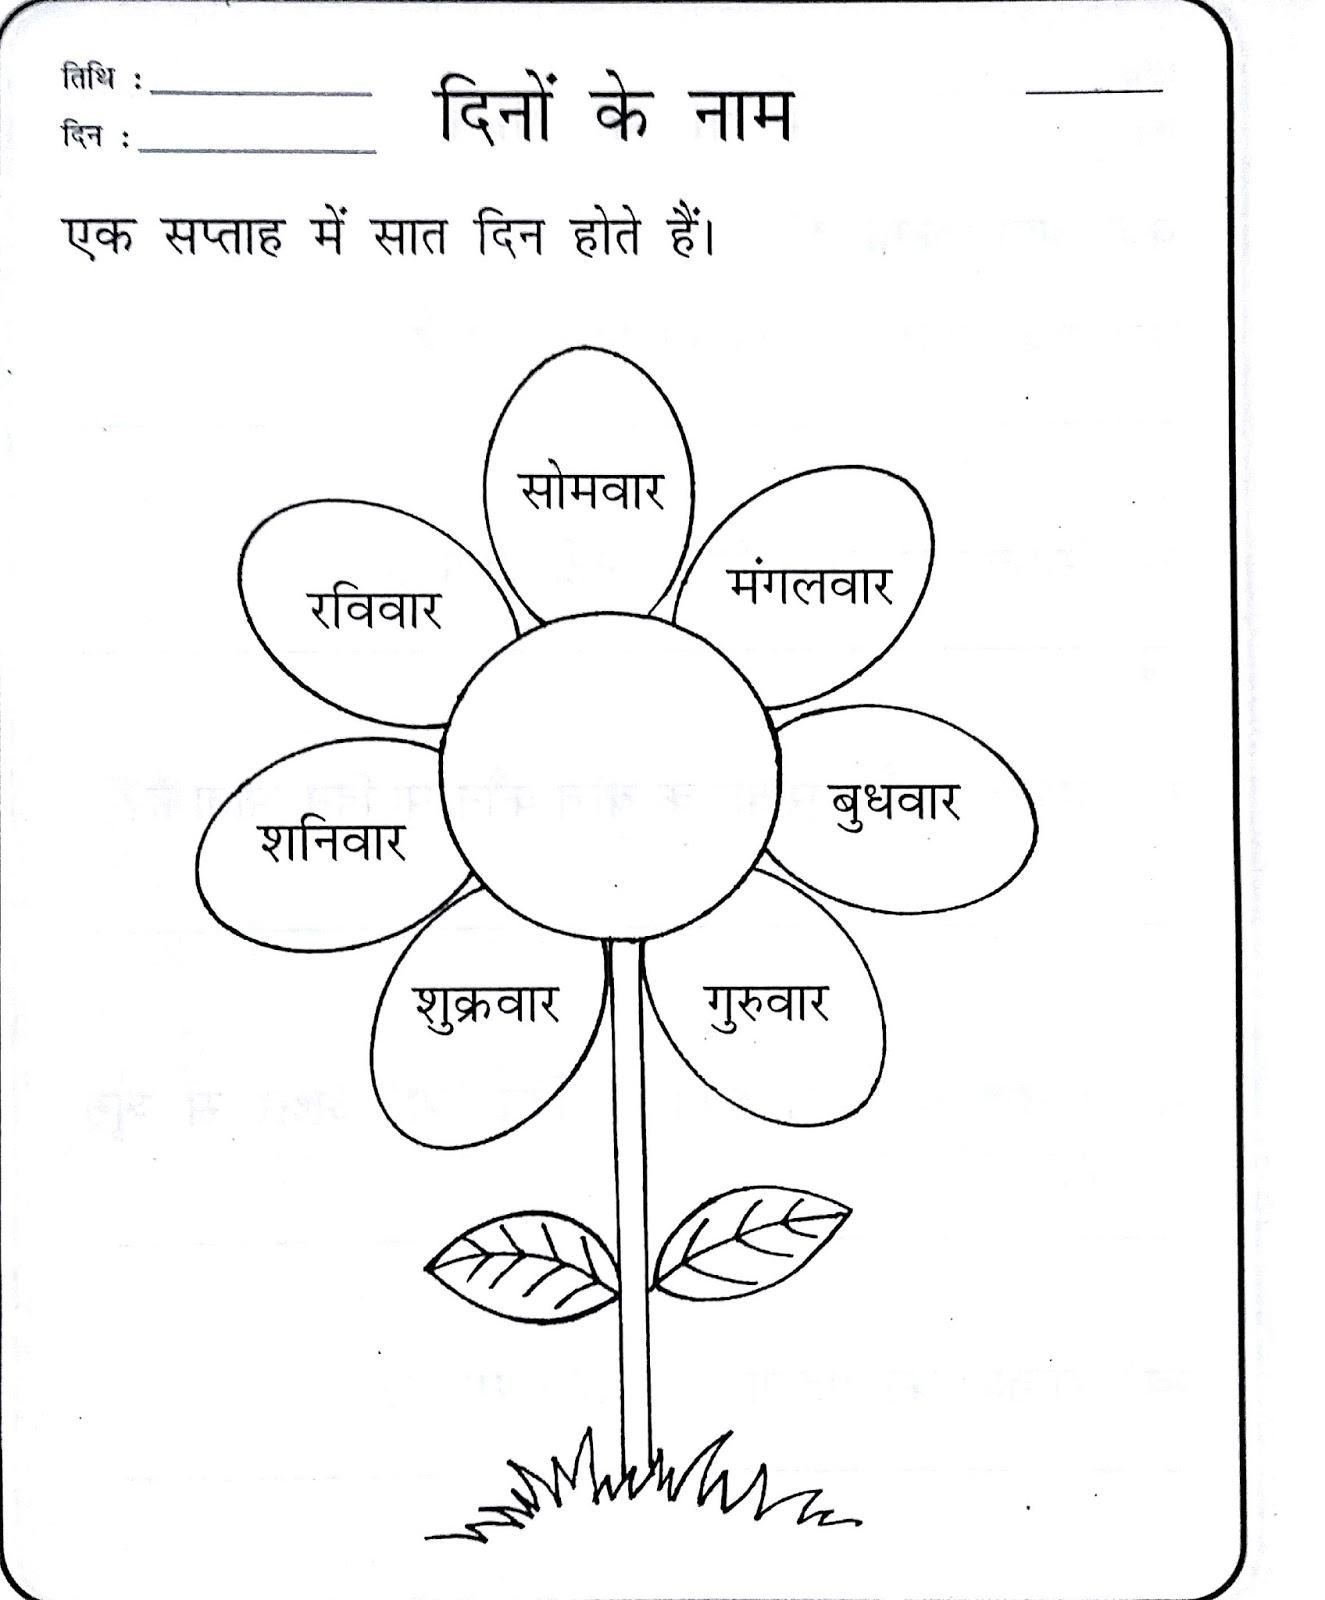 medium resolution of Hindi Worksheets Grade 1   Printable Worksheets and Activities for  Teachers